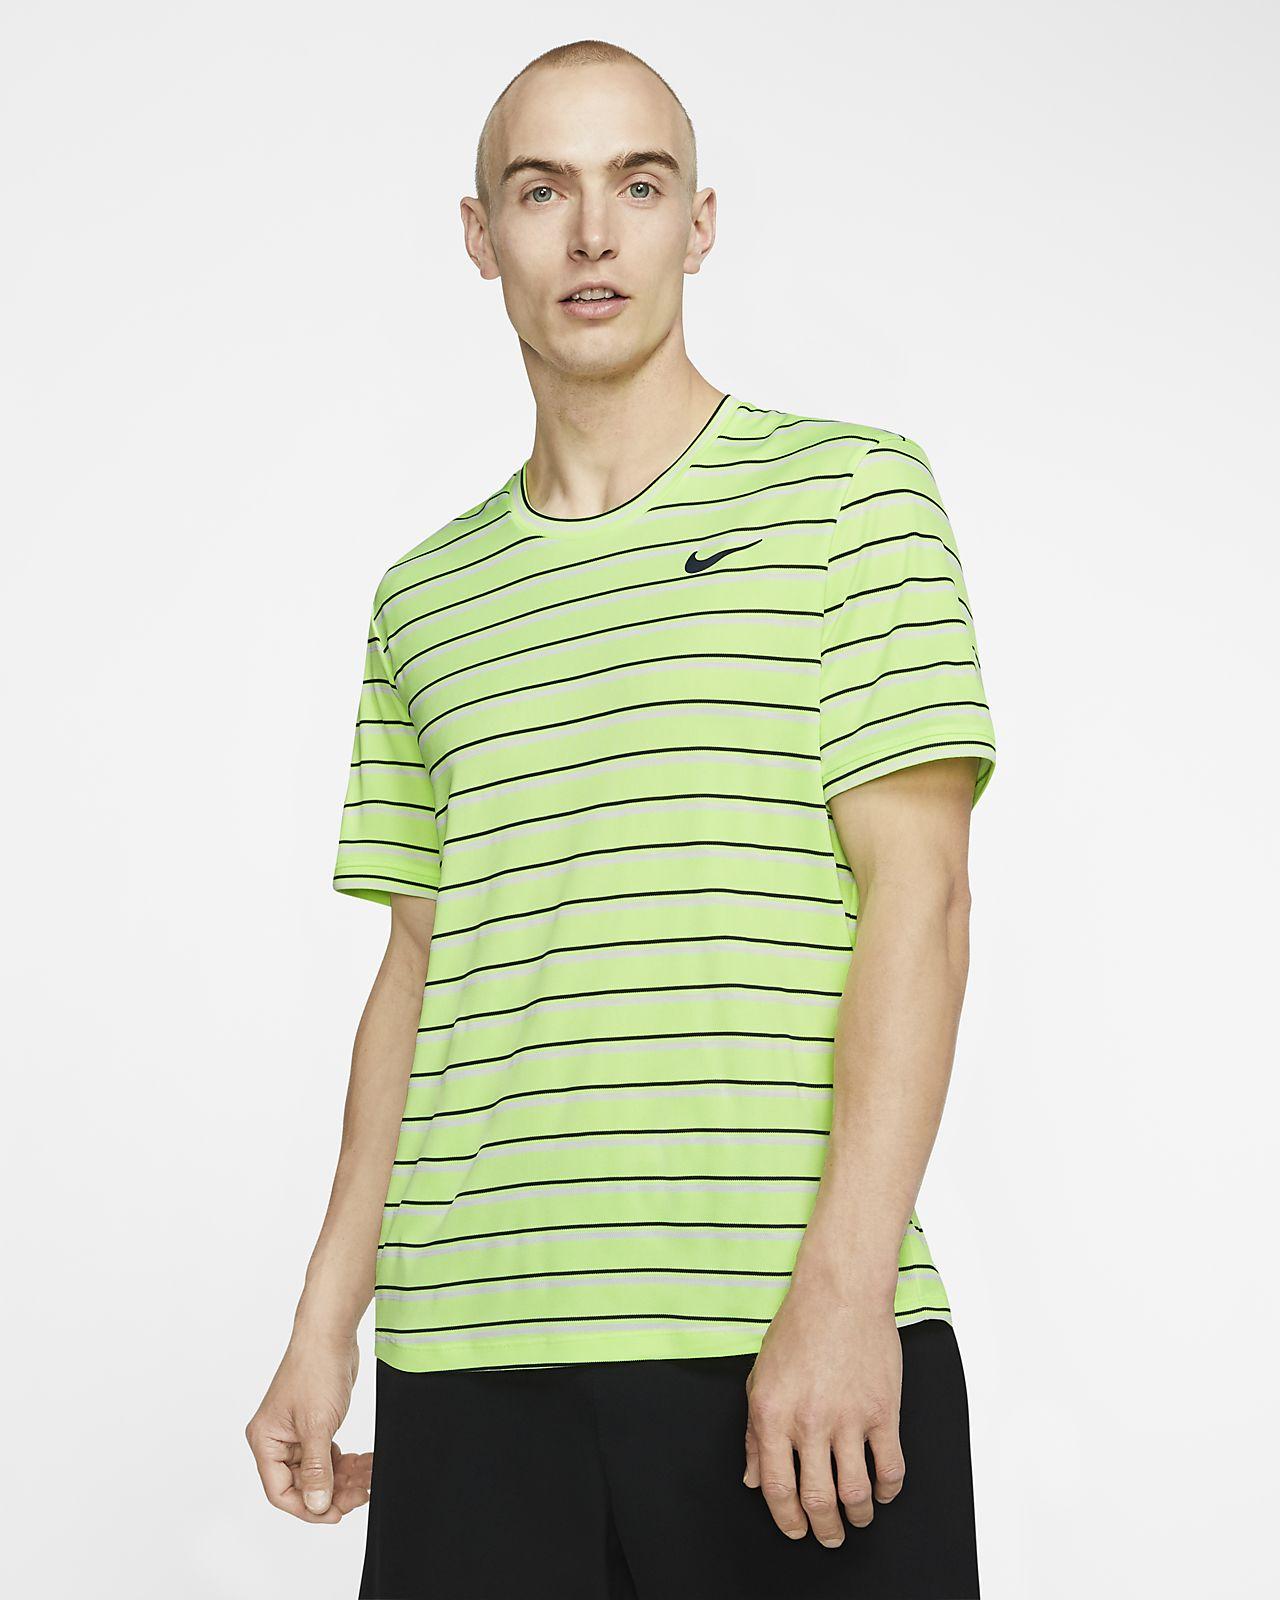 NikeCourt Dri FIT Men's Graphic Tennis Top